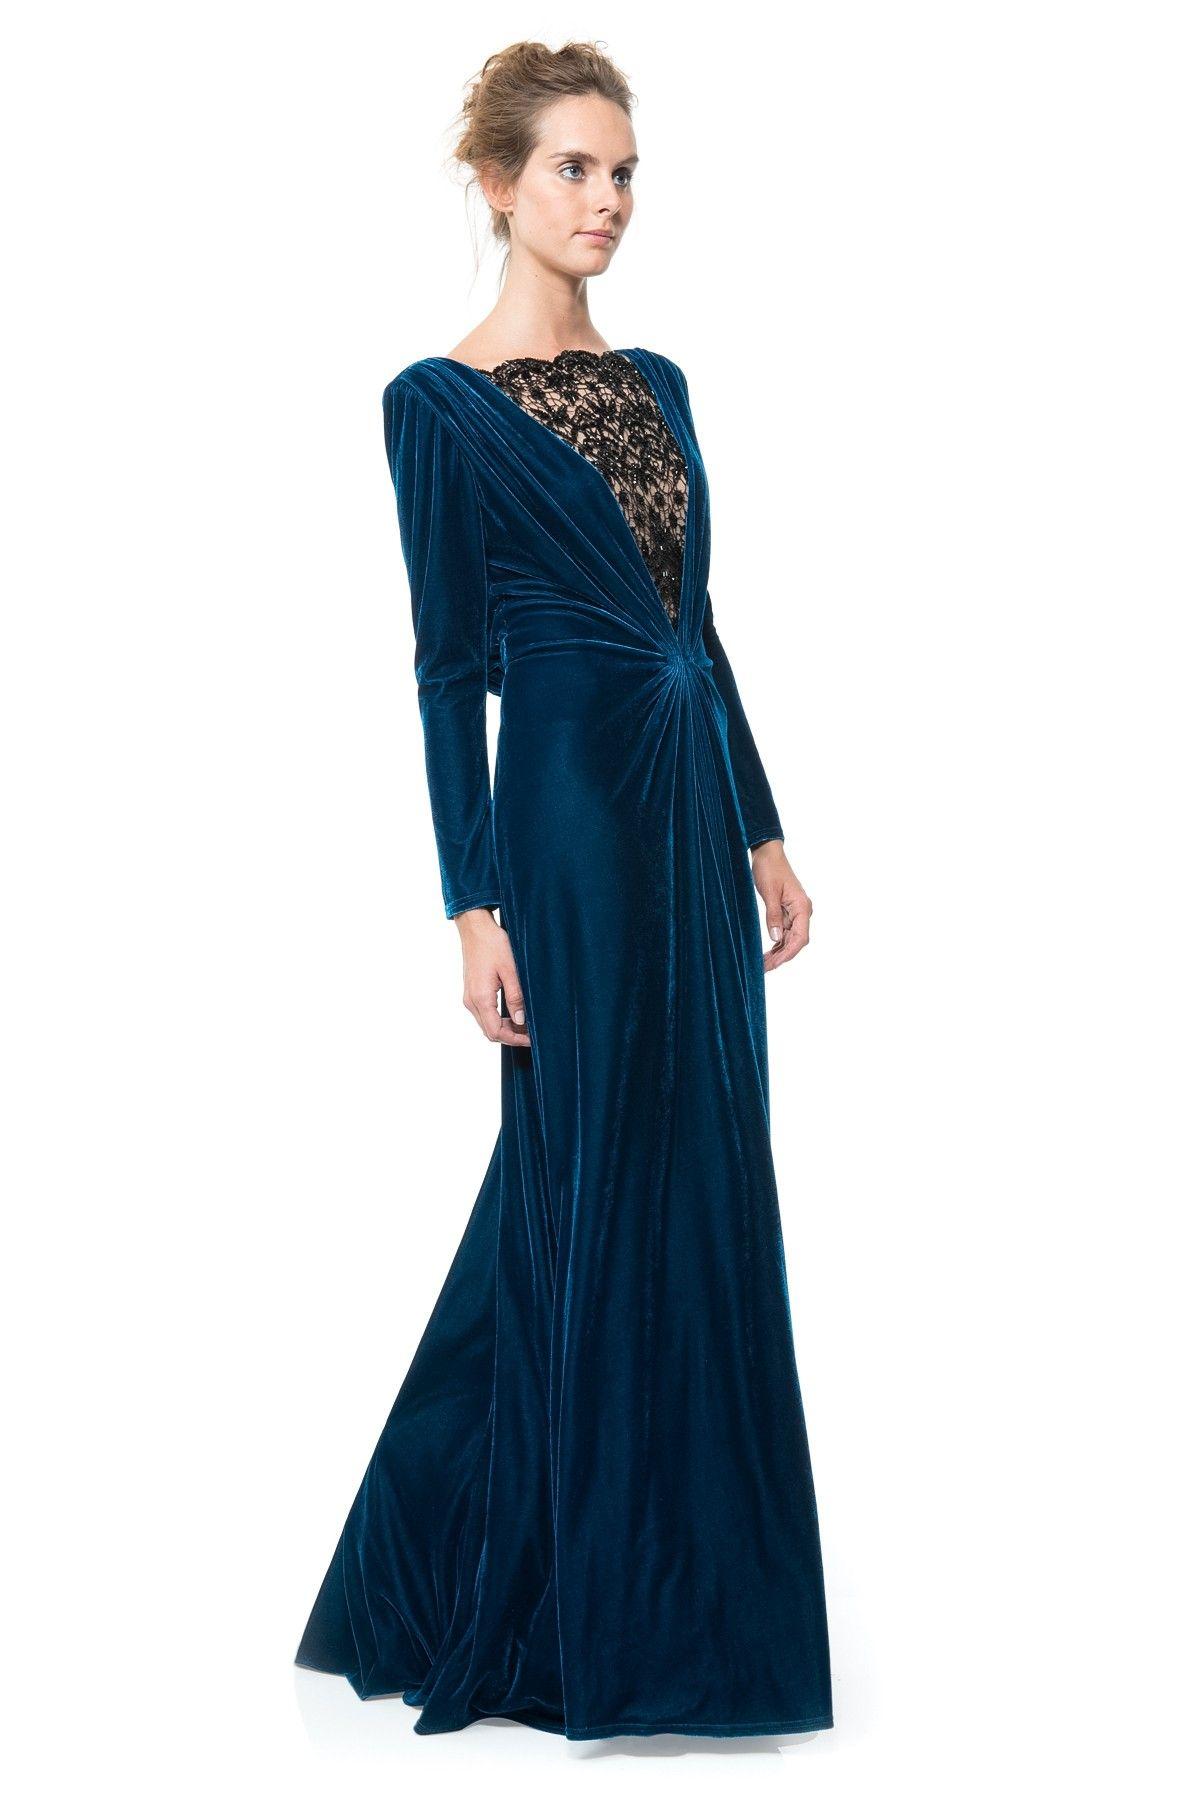 downton abbey inspired style draped velvet gown tadashi shoji vermehrt sch nes. Black Bedroom Furniture Sets. Home Design Ideas